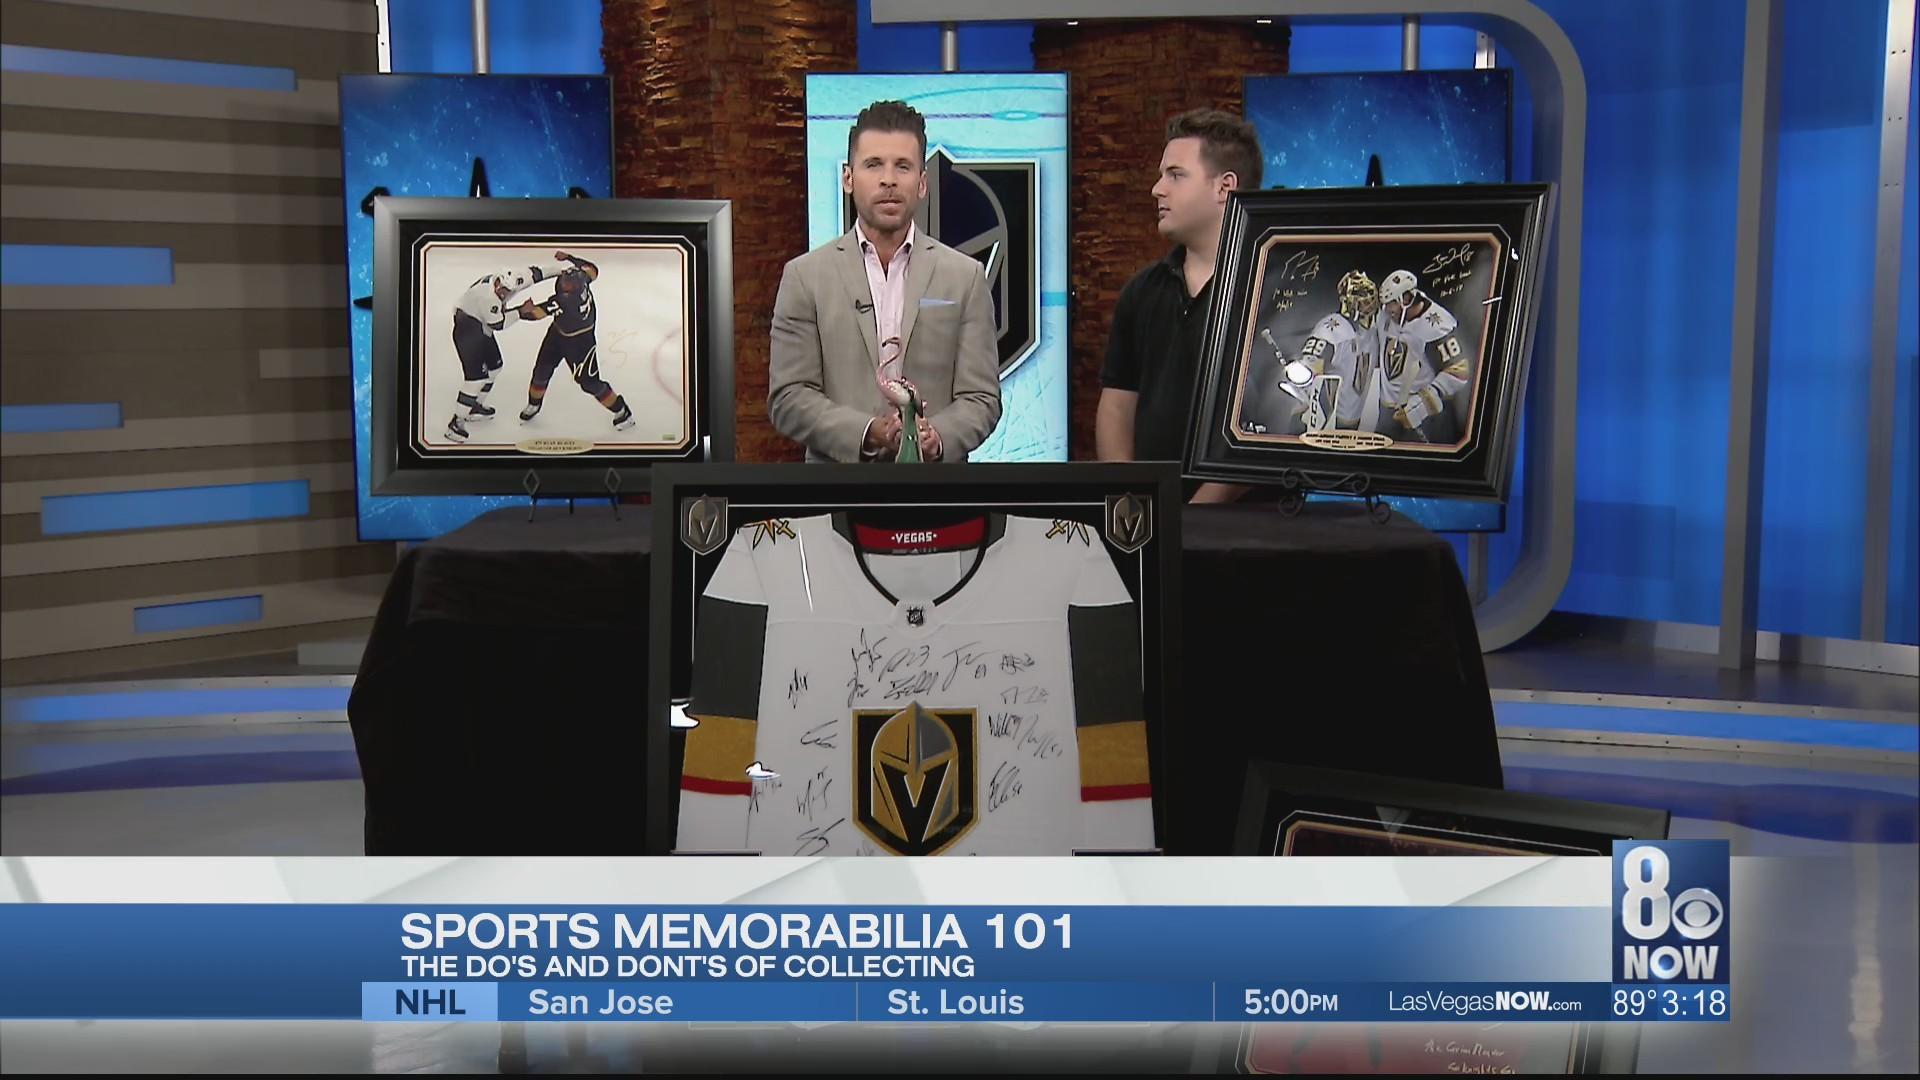 Sports memorabilia 101 with expert Tyler Feldman